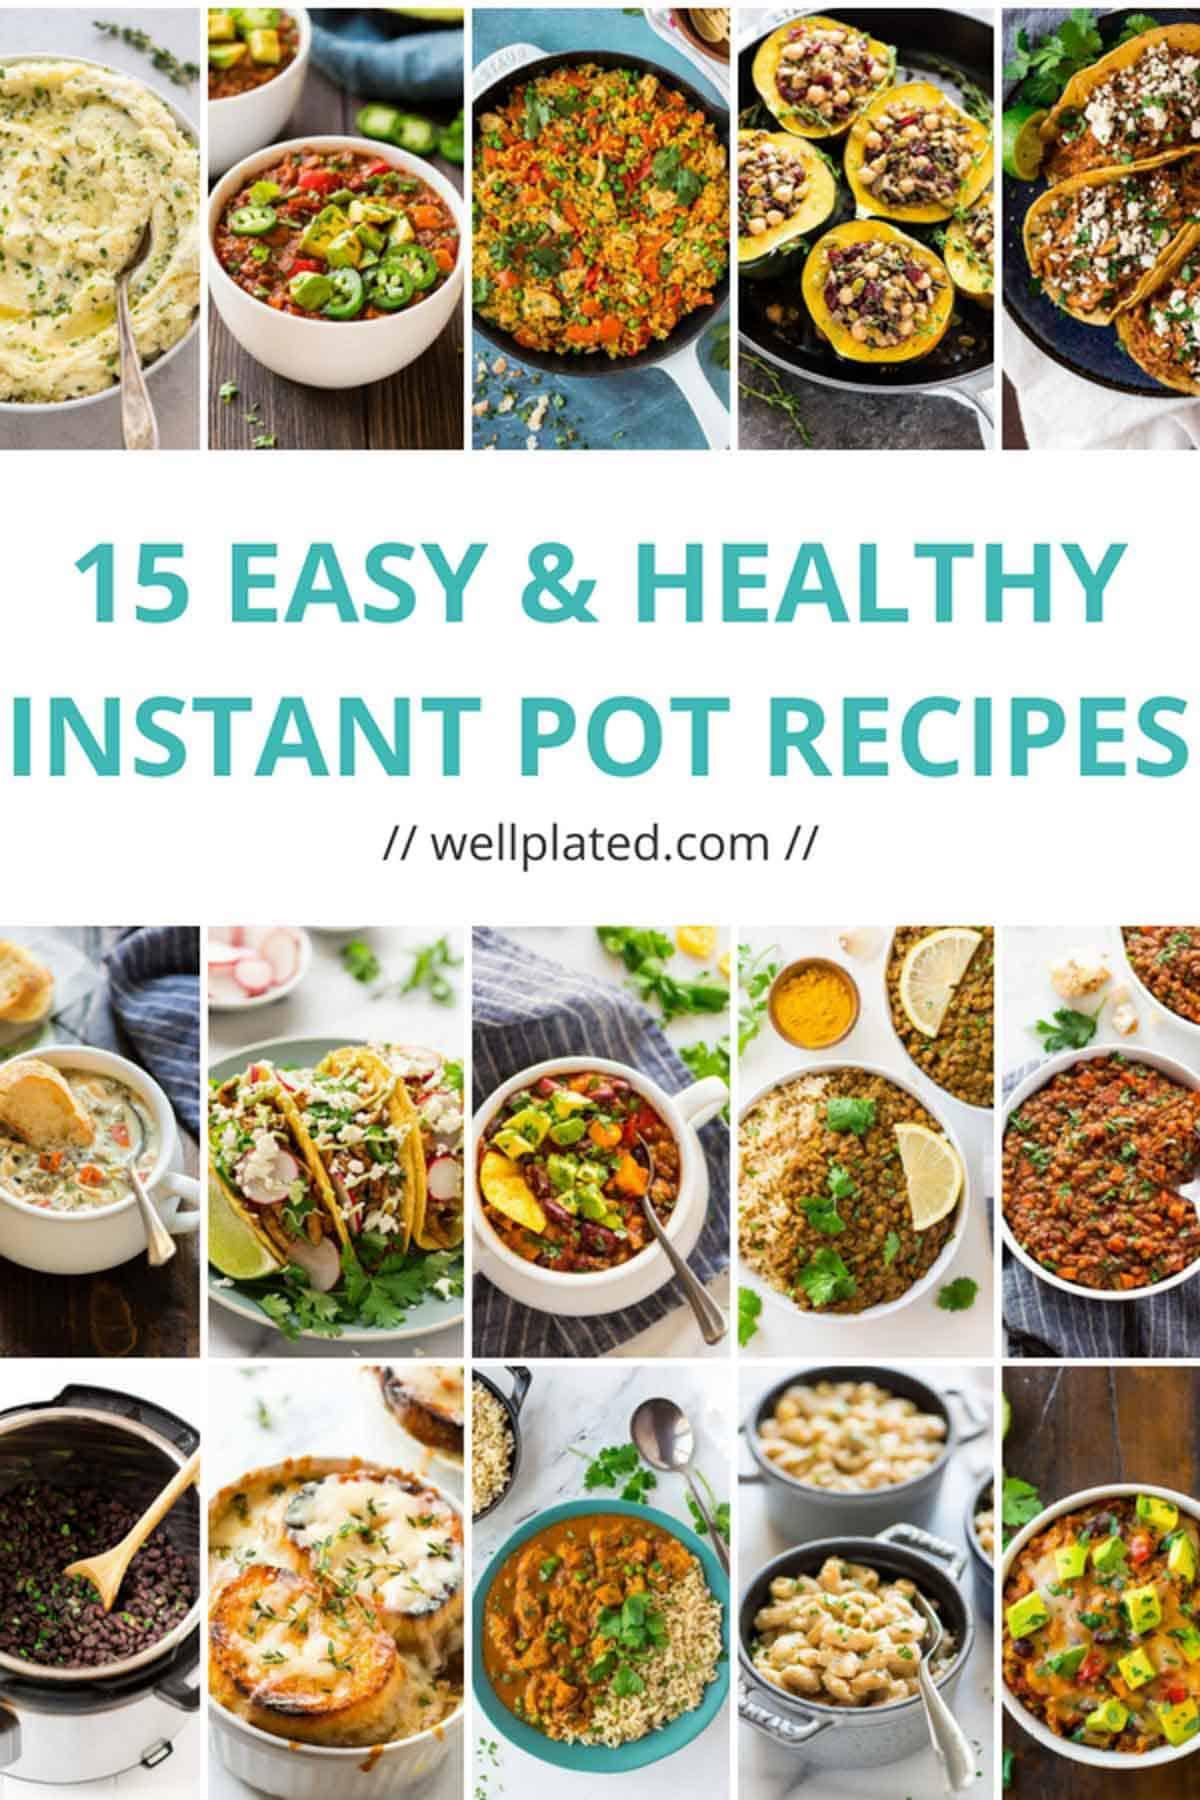 Healthy Instant Pot Recipes  15 Healthy Instant Pot Recipes That Anyone Can Make